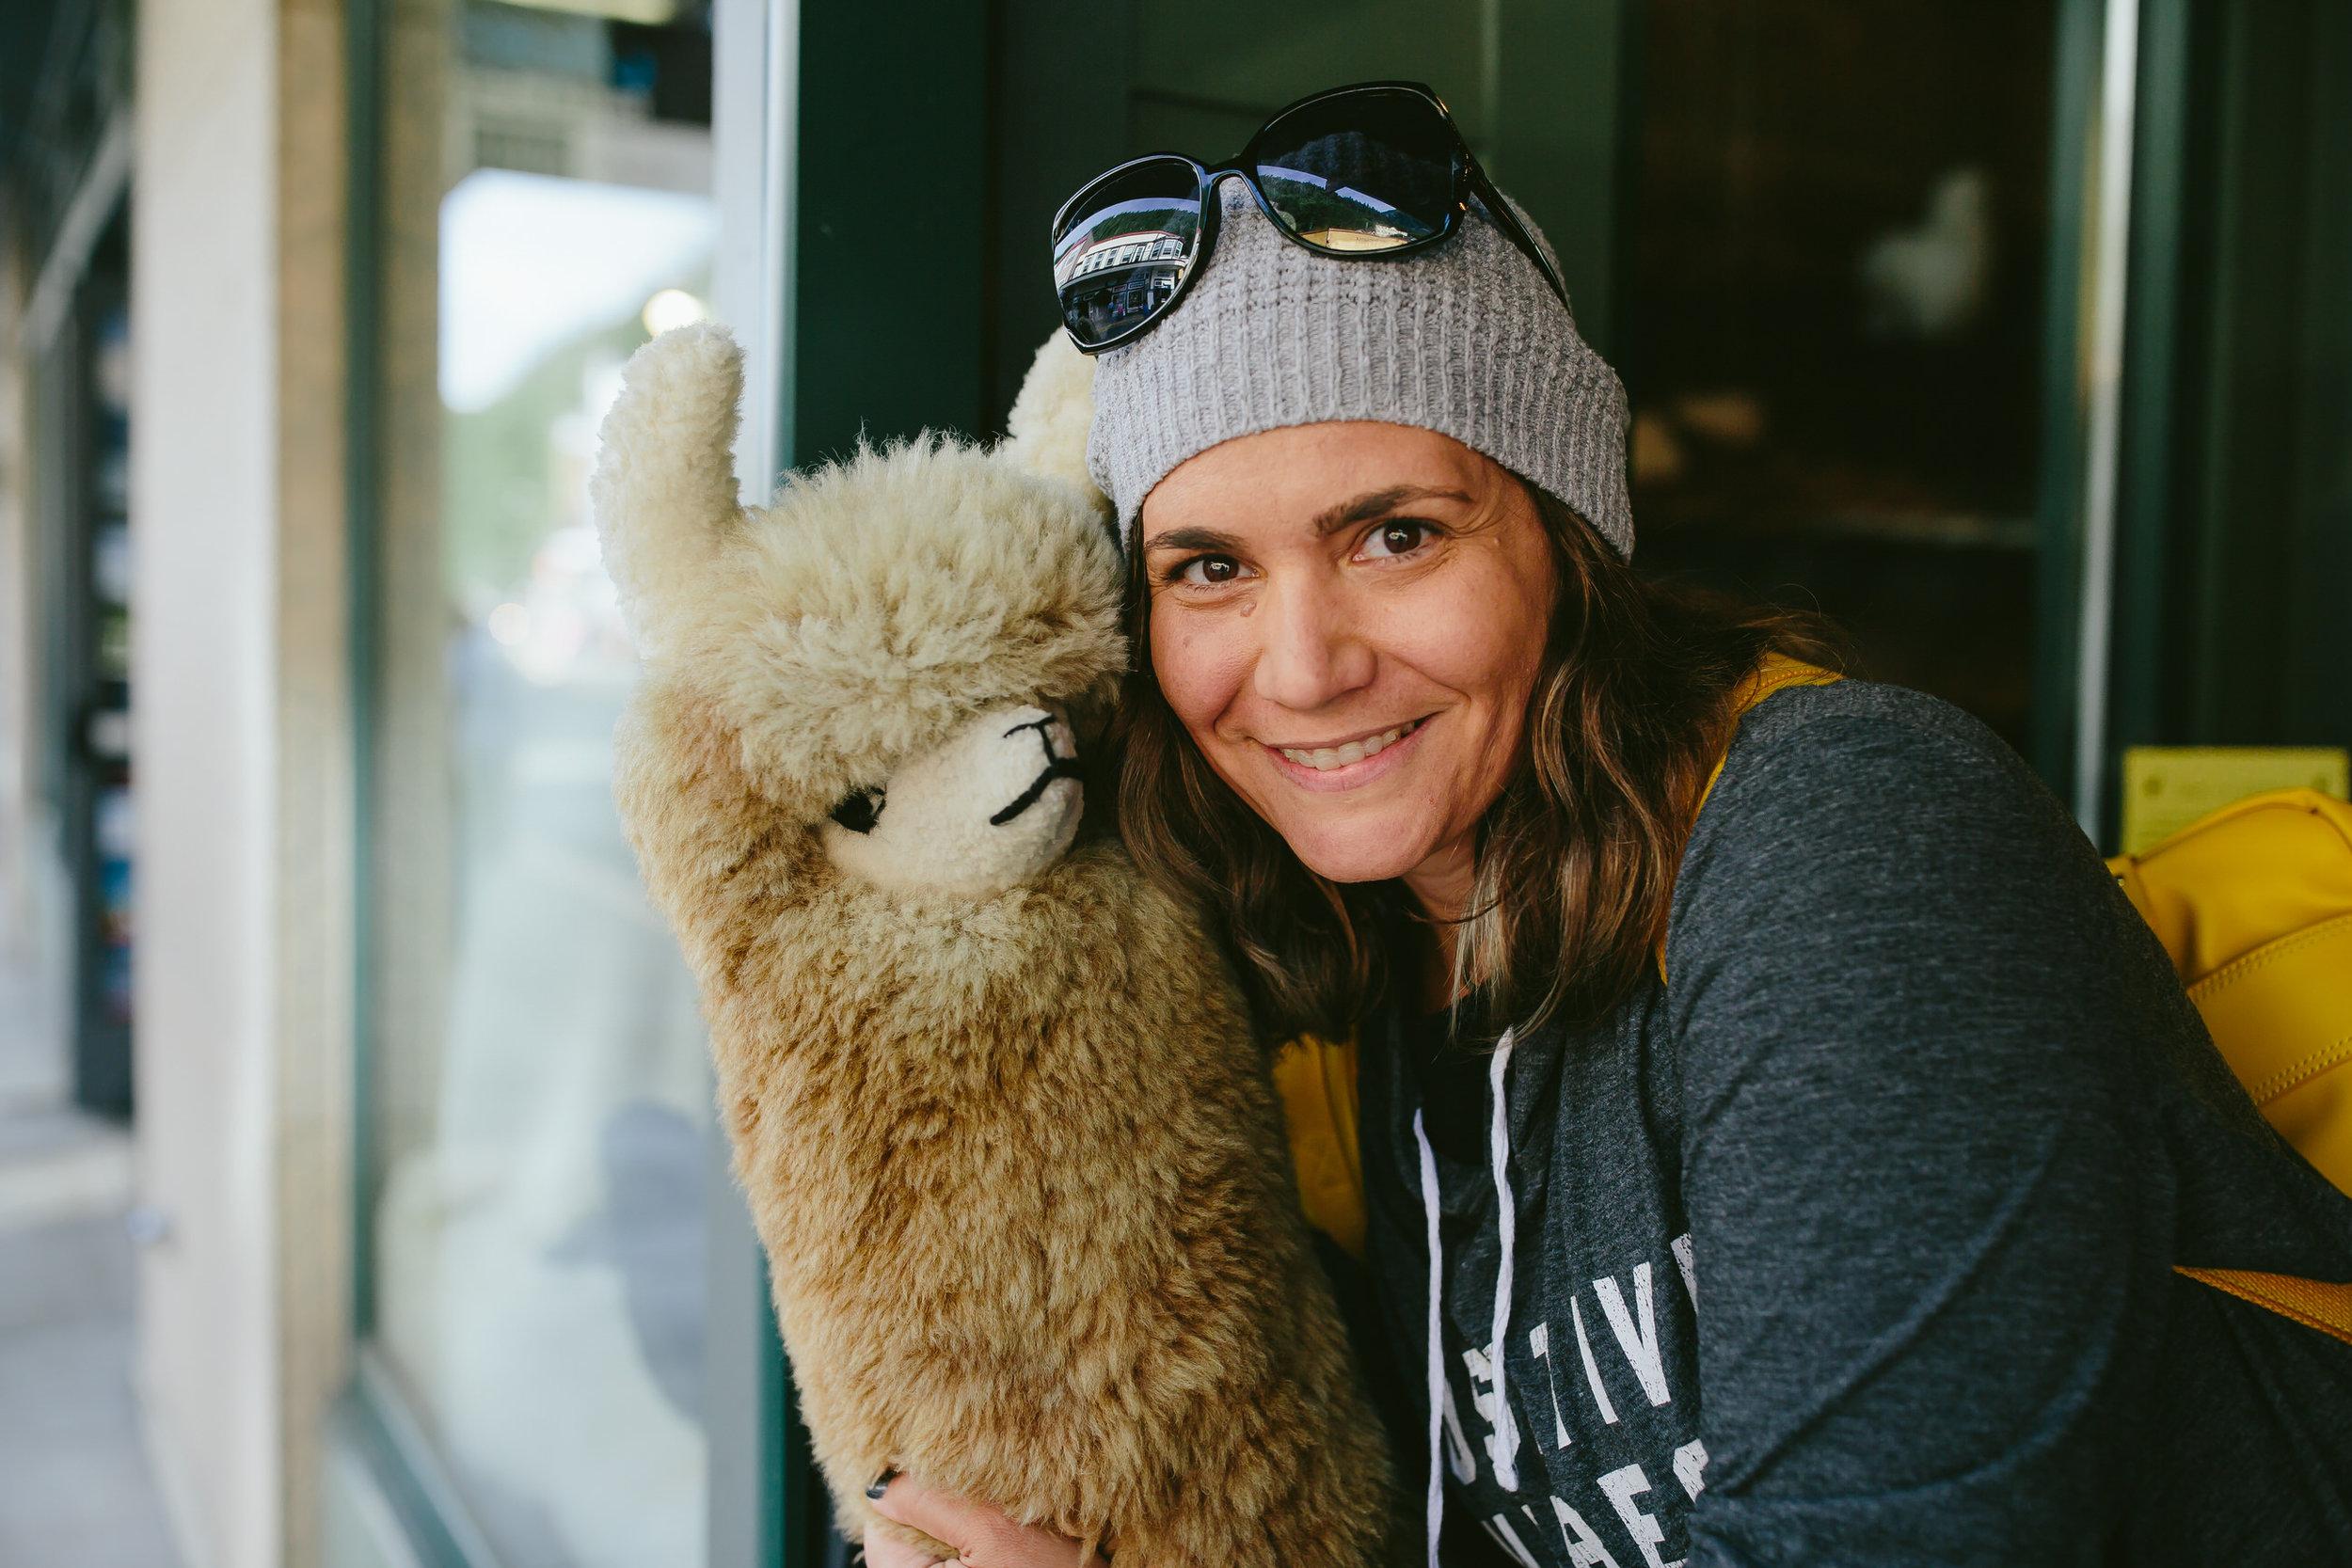 stephie loves llamas!